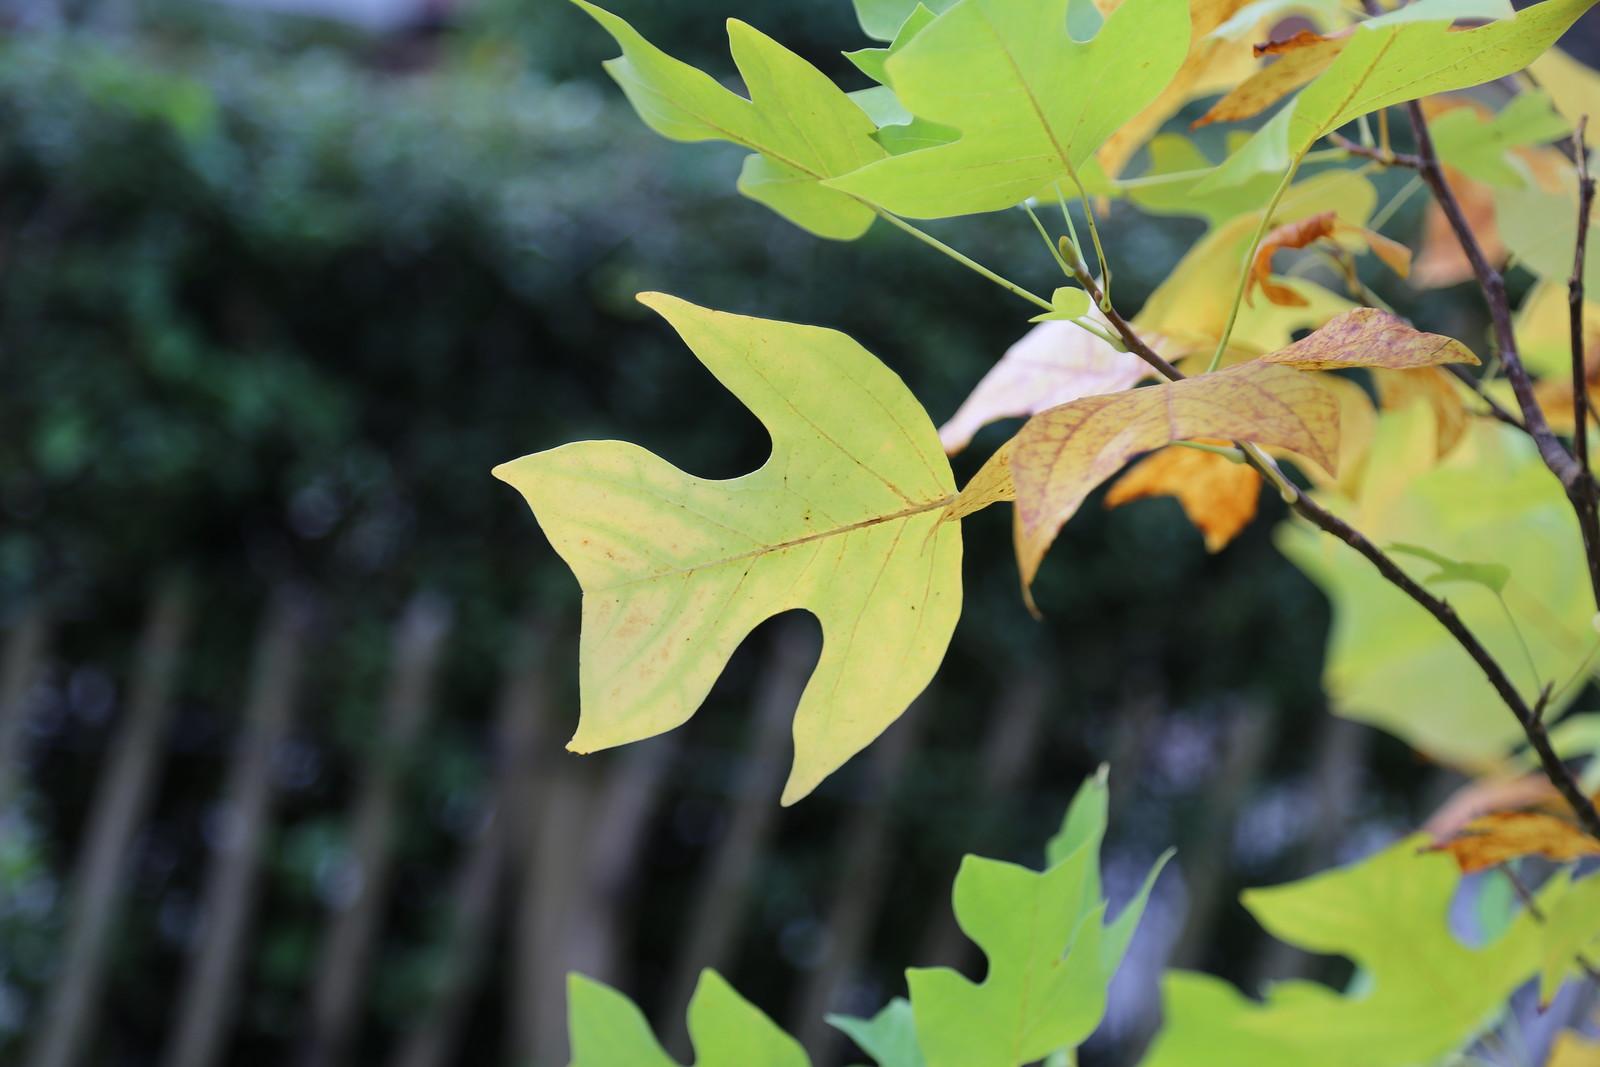 Tulip Tree leaf - Haywards Heath Lirodendron chinensa (or hybrid)